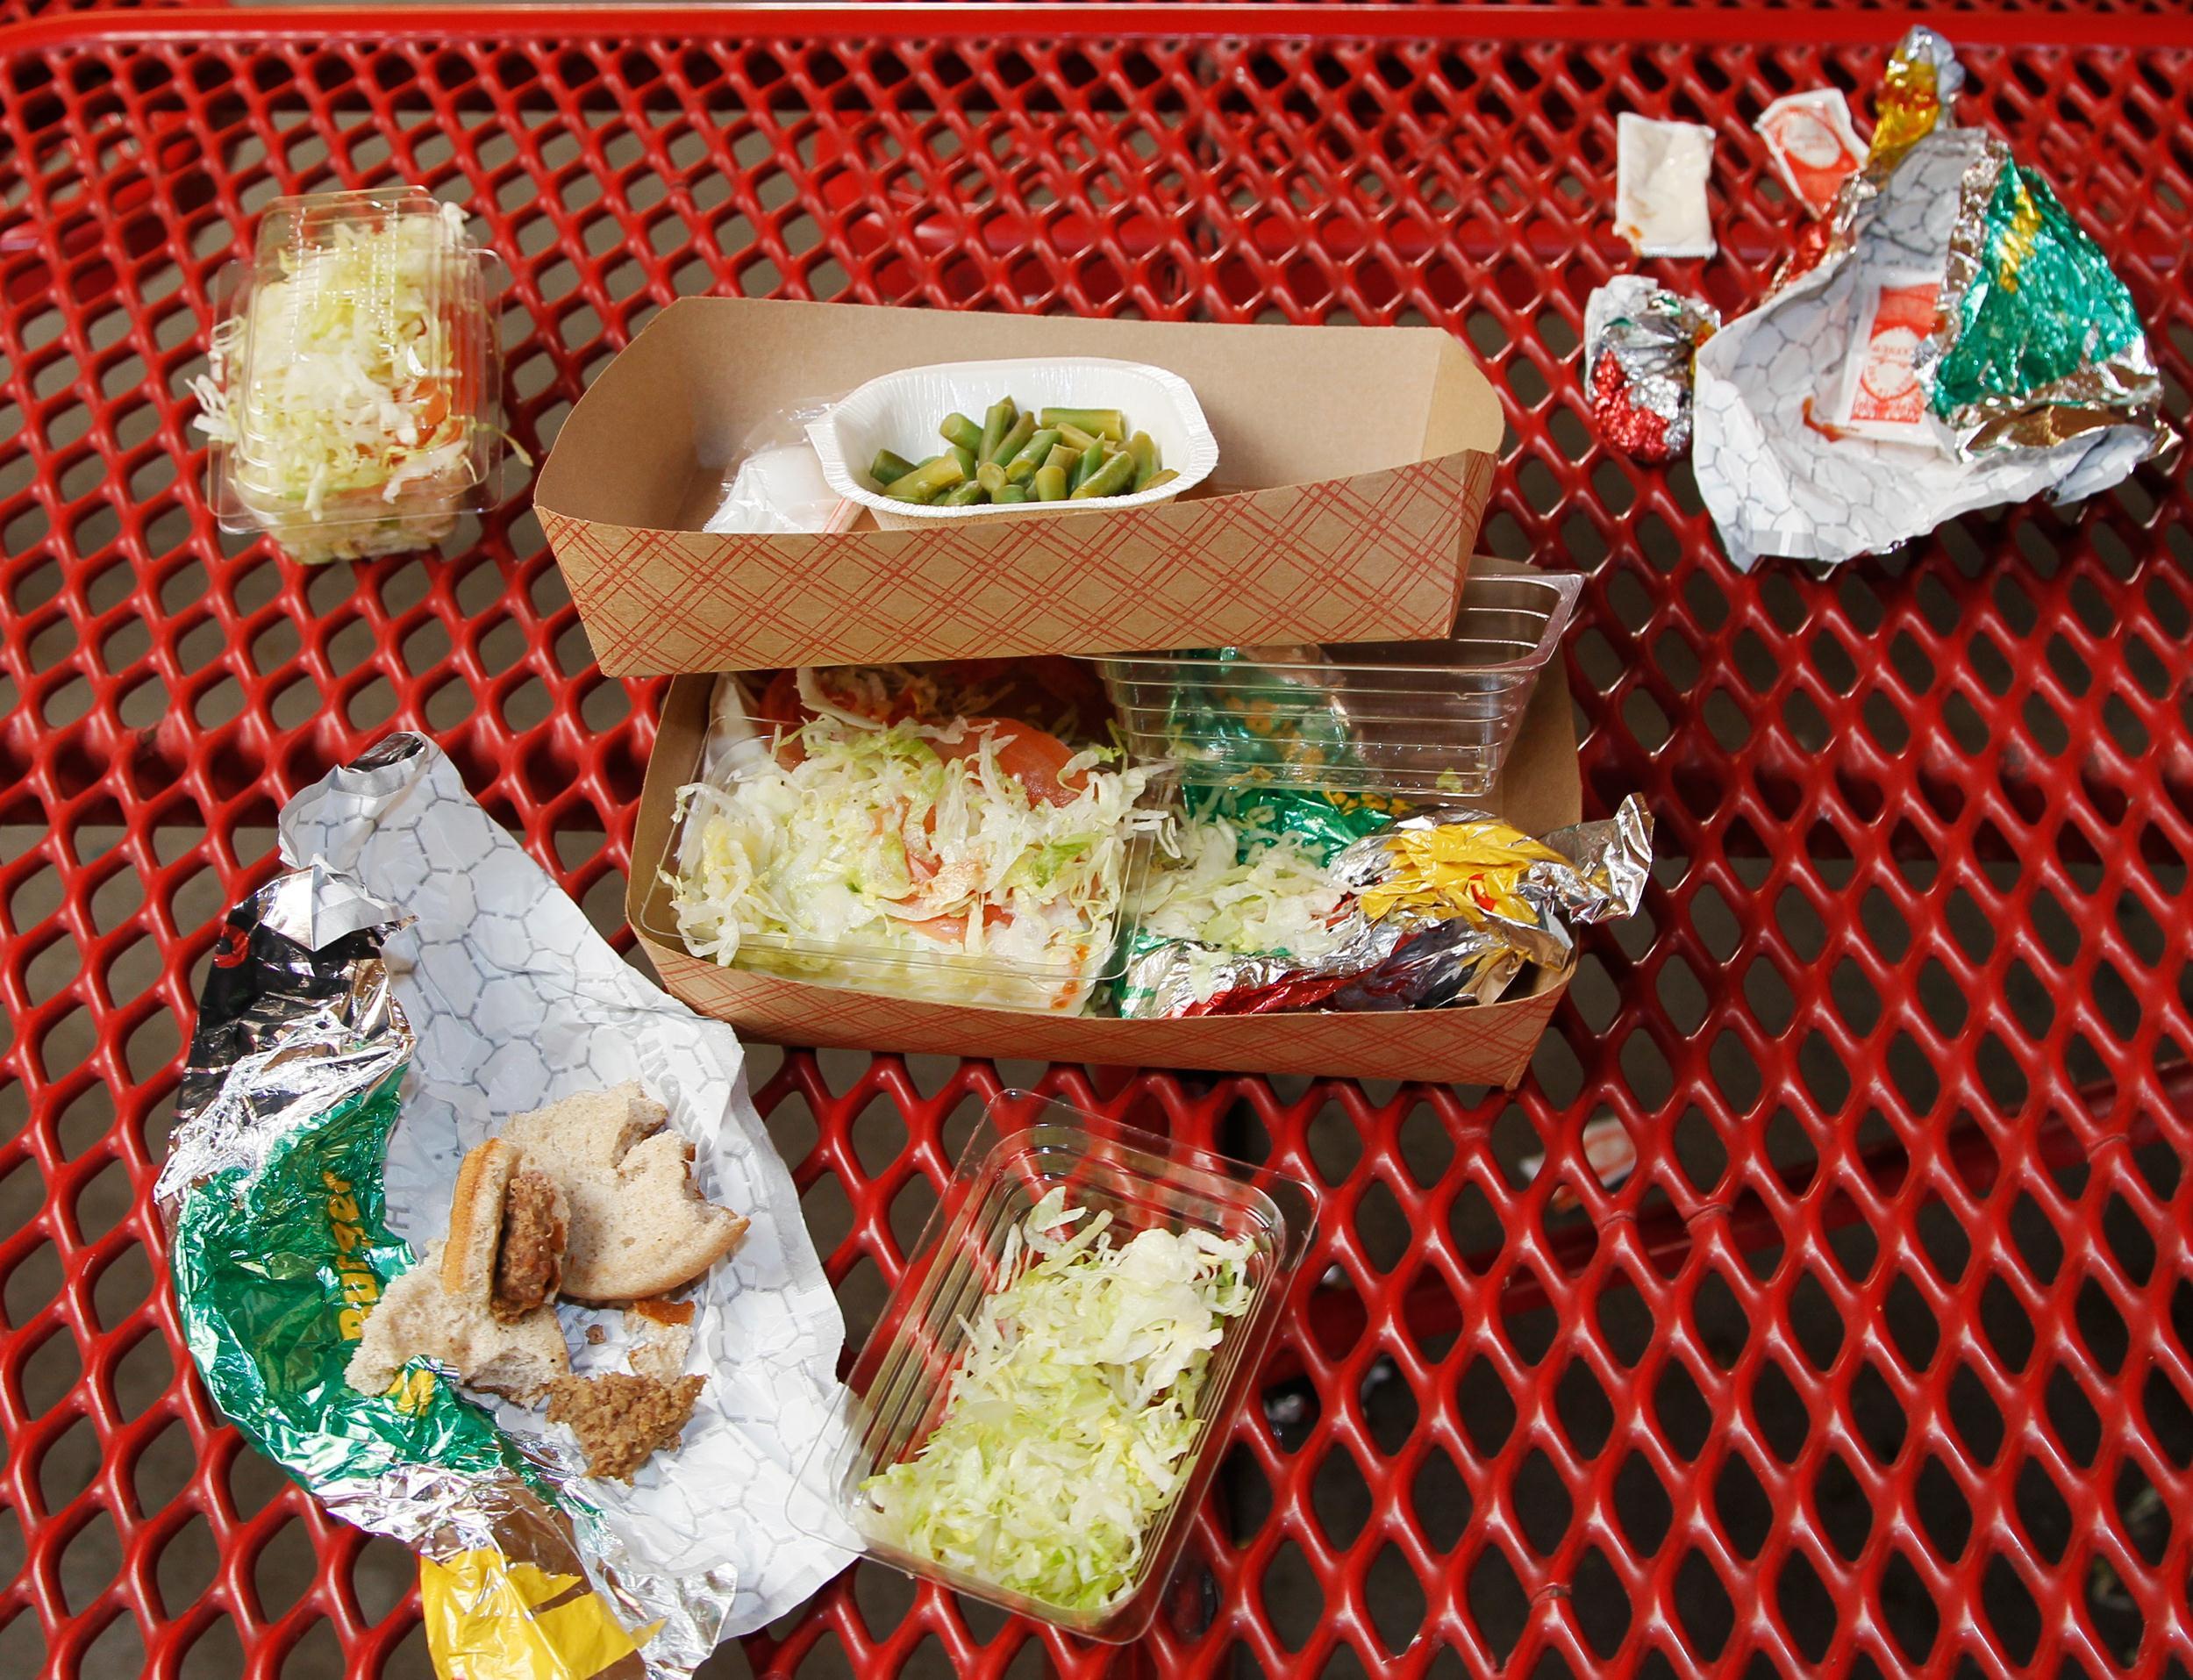 Cleaner Plate Club Kids Eat More Fruits Veggies At School